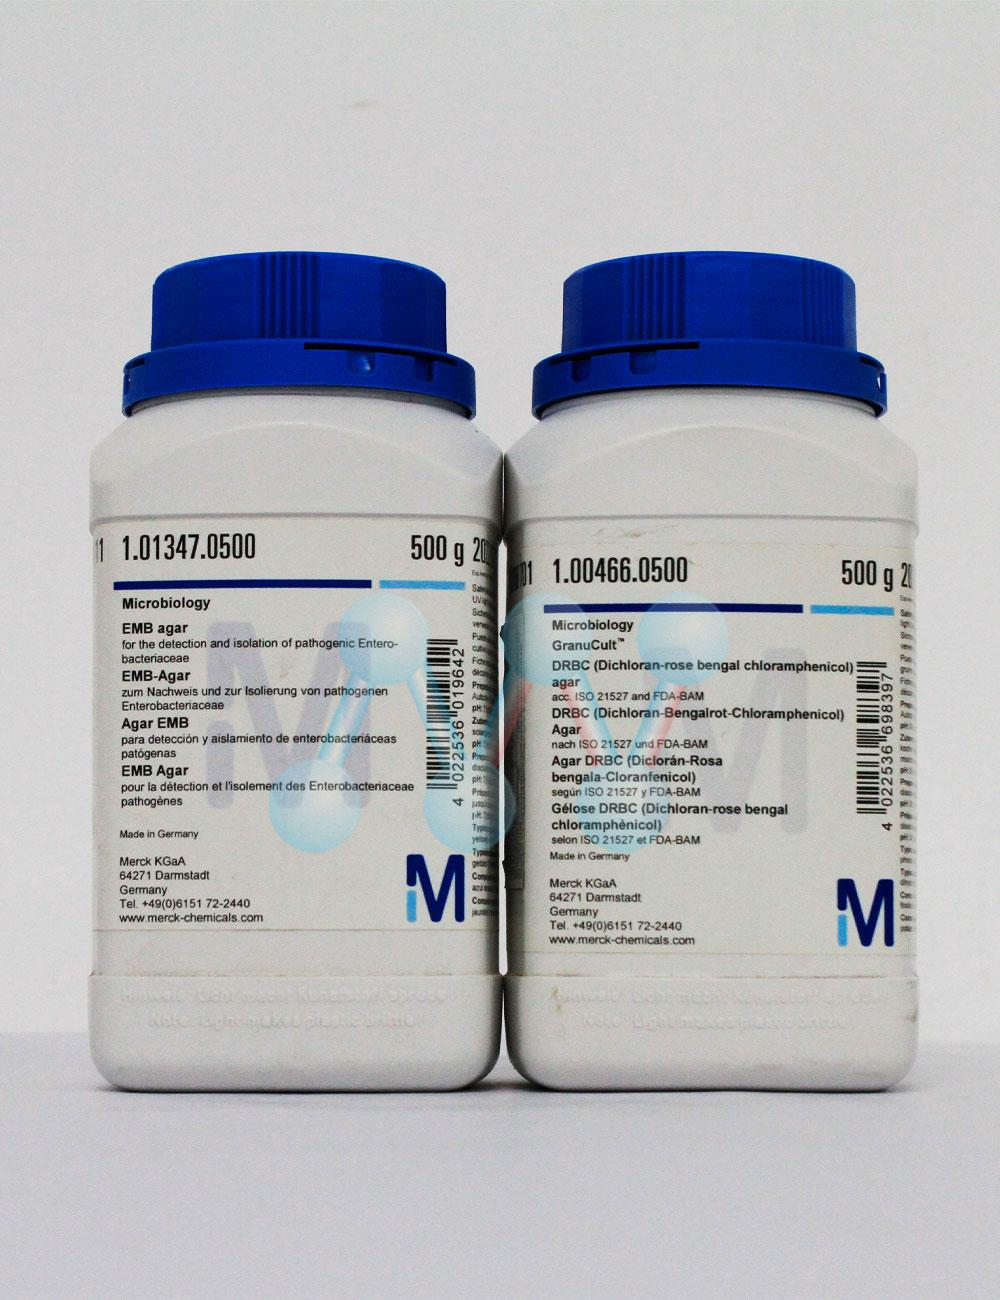 YGC (Yeast extract glucose chloramphenicol) agar